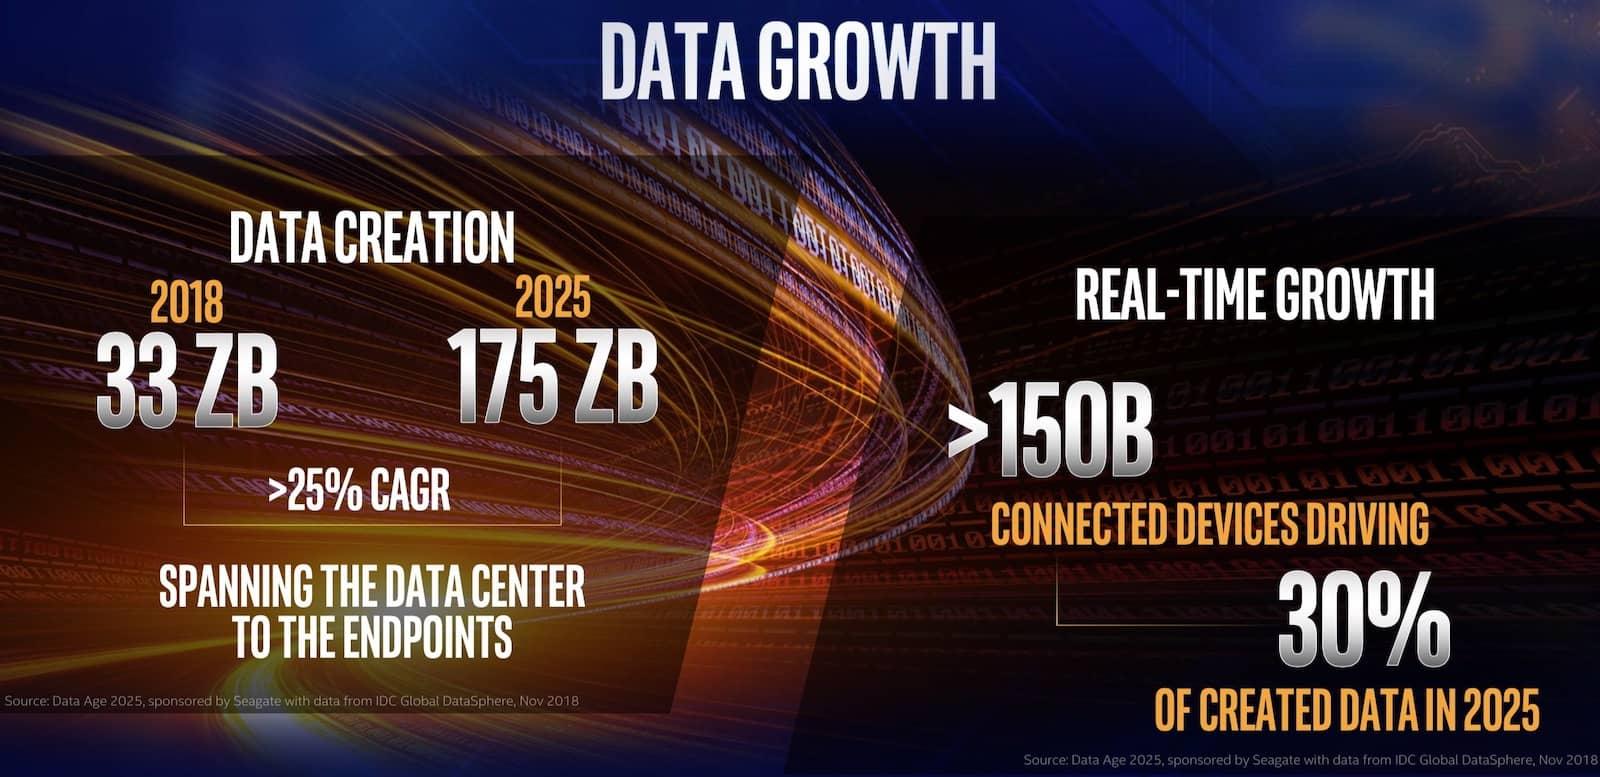 data-growth.jpg